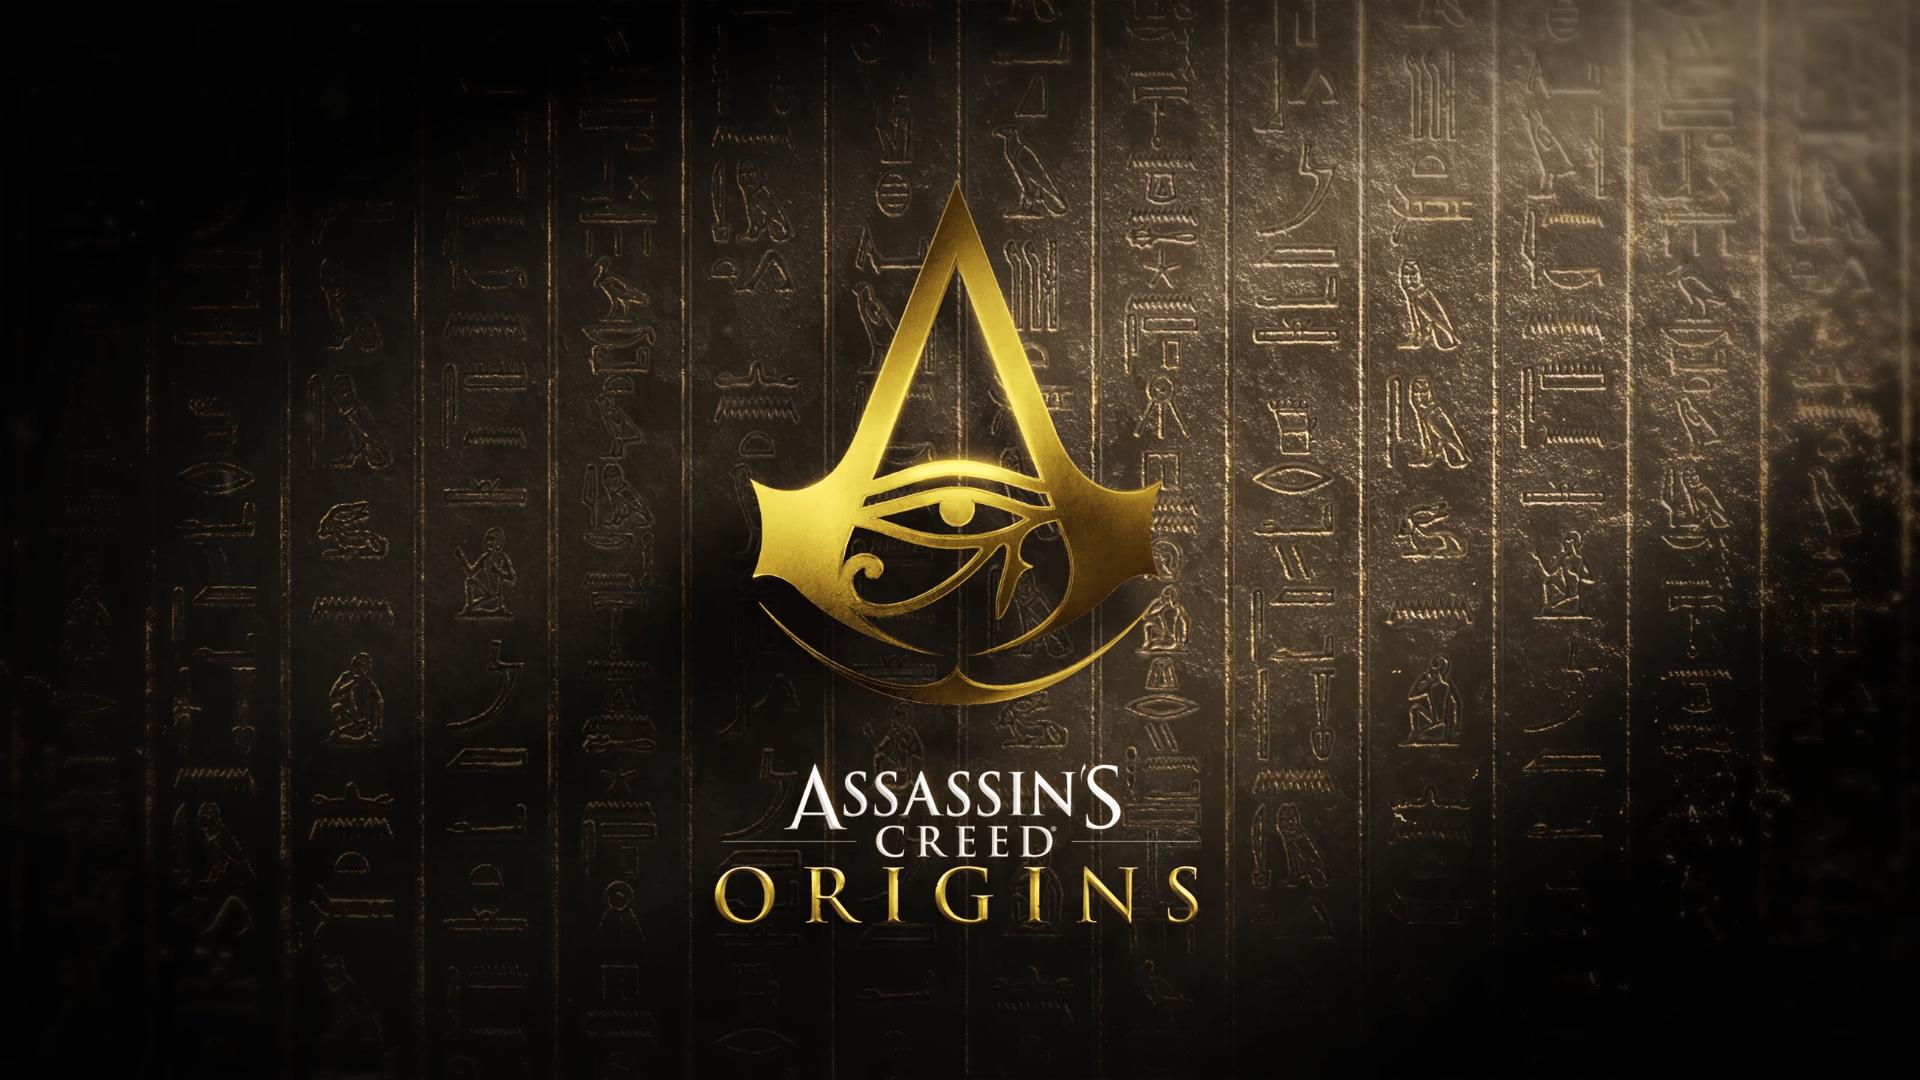 Assassin's Creed: Origins Wallpapers